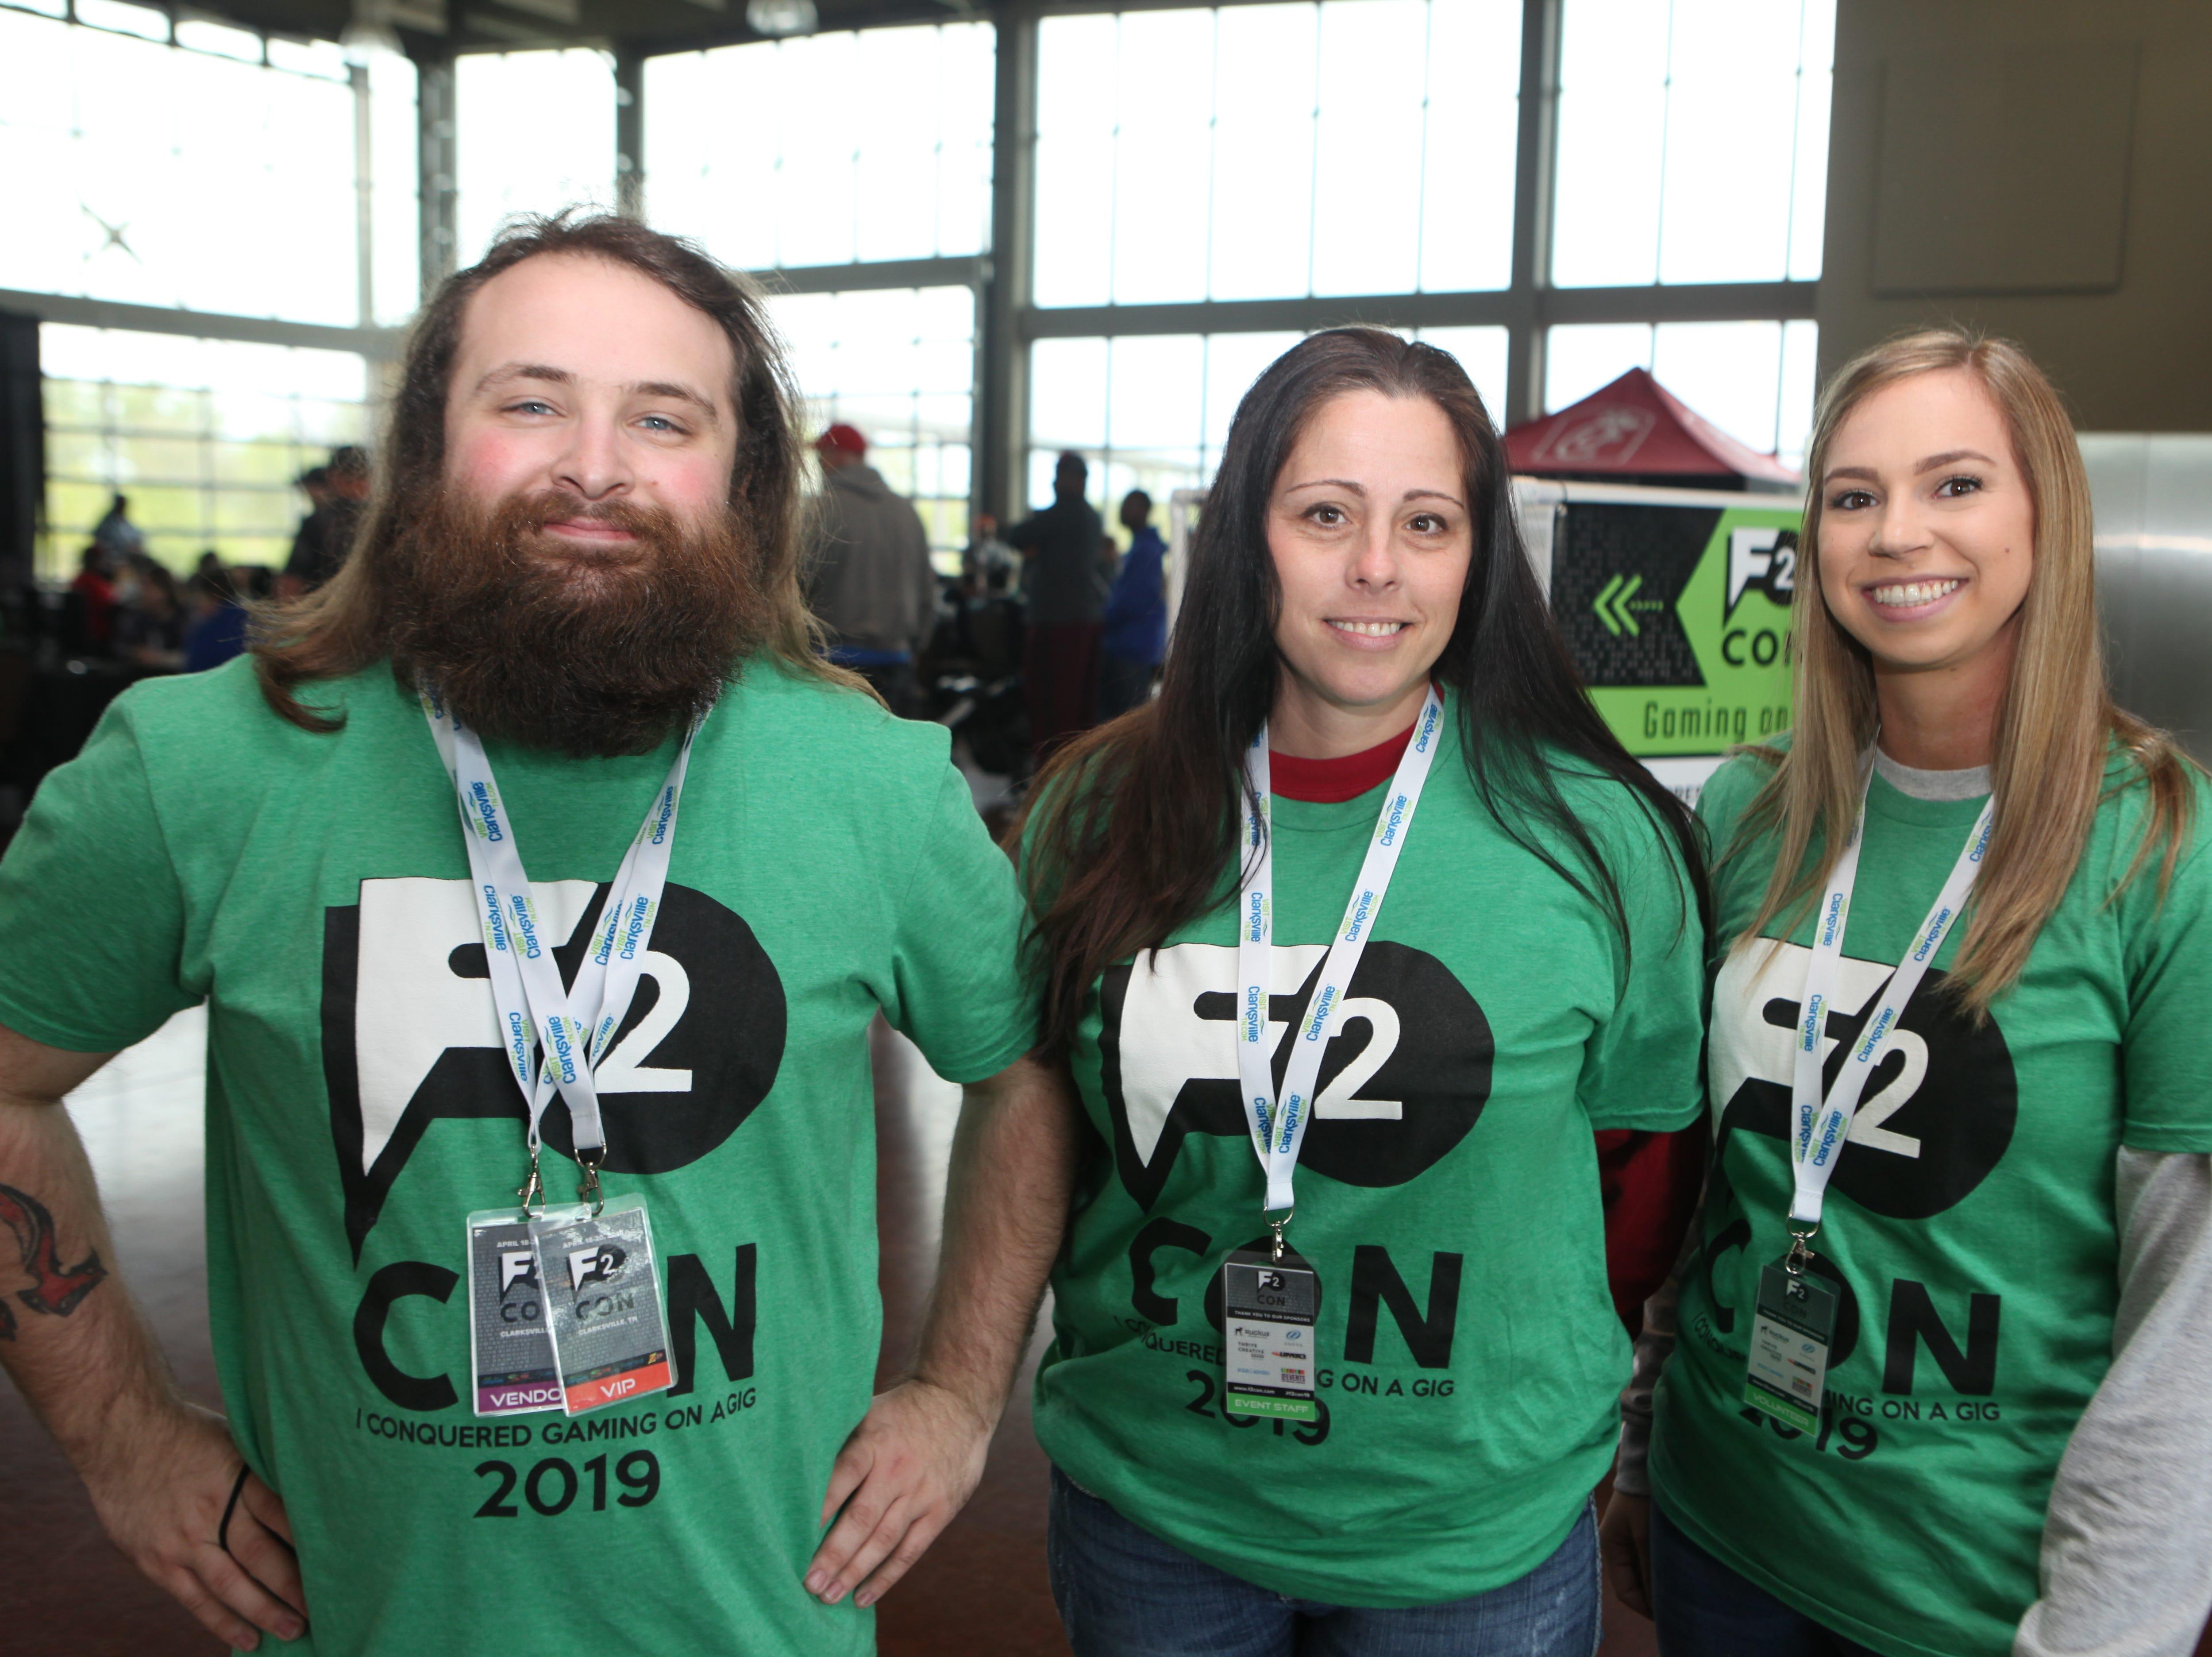 Phil Priem, Jennifer Mills and Sarah Eaken at the second annual F2 Con Gaming Tournament on Saturday, April 20, 2019.